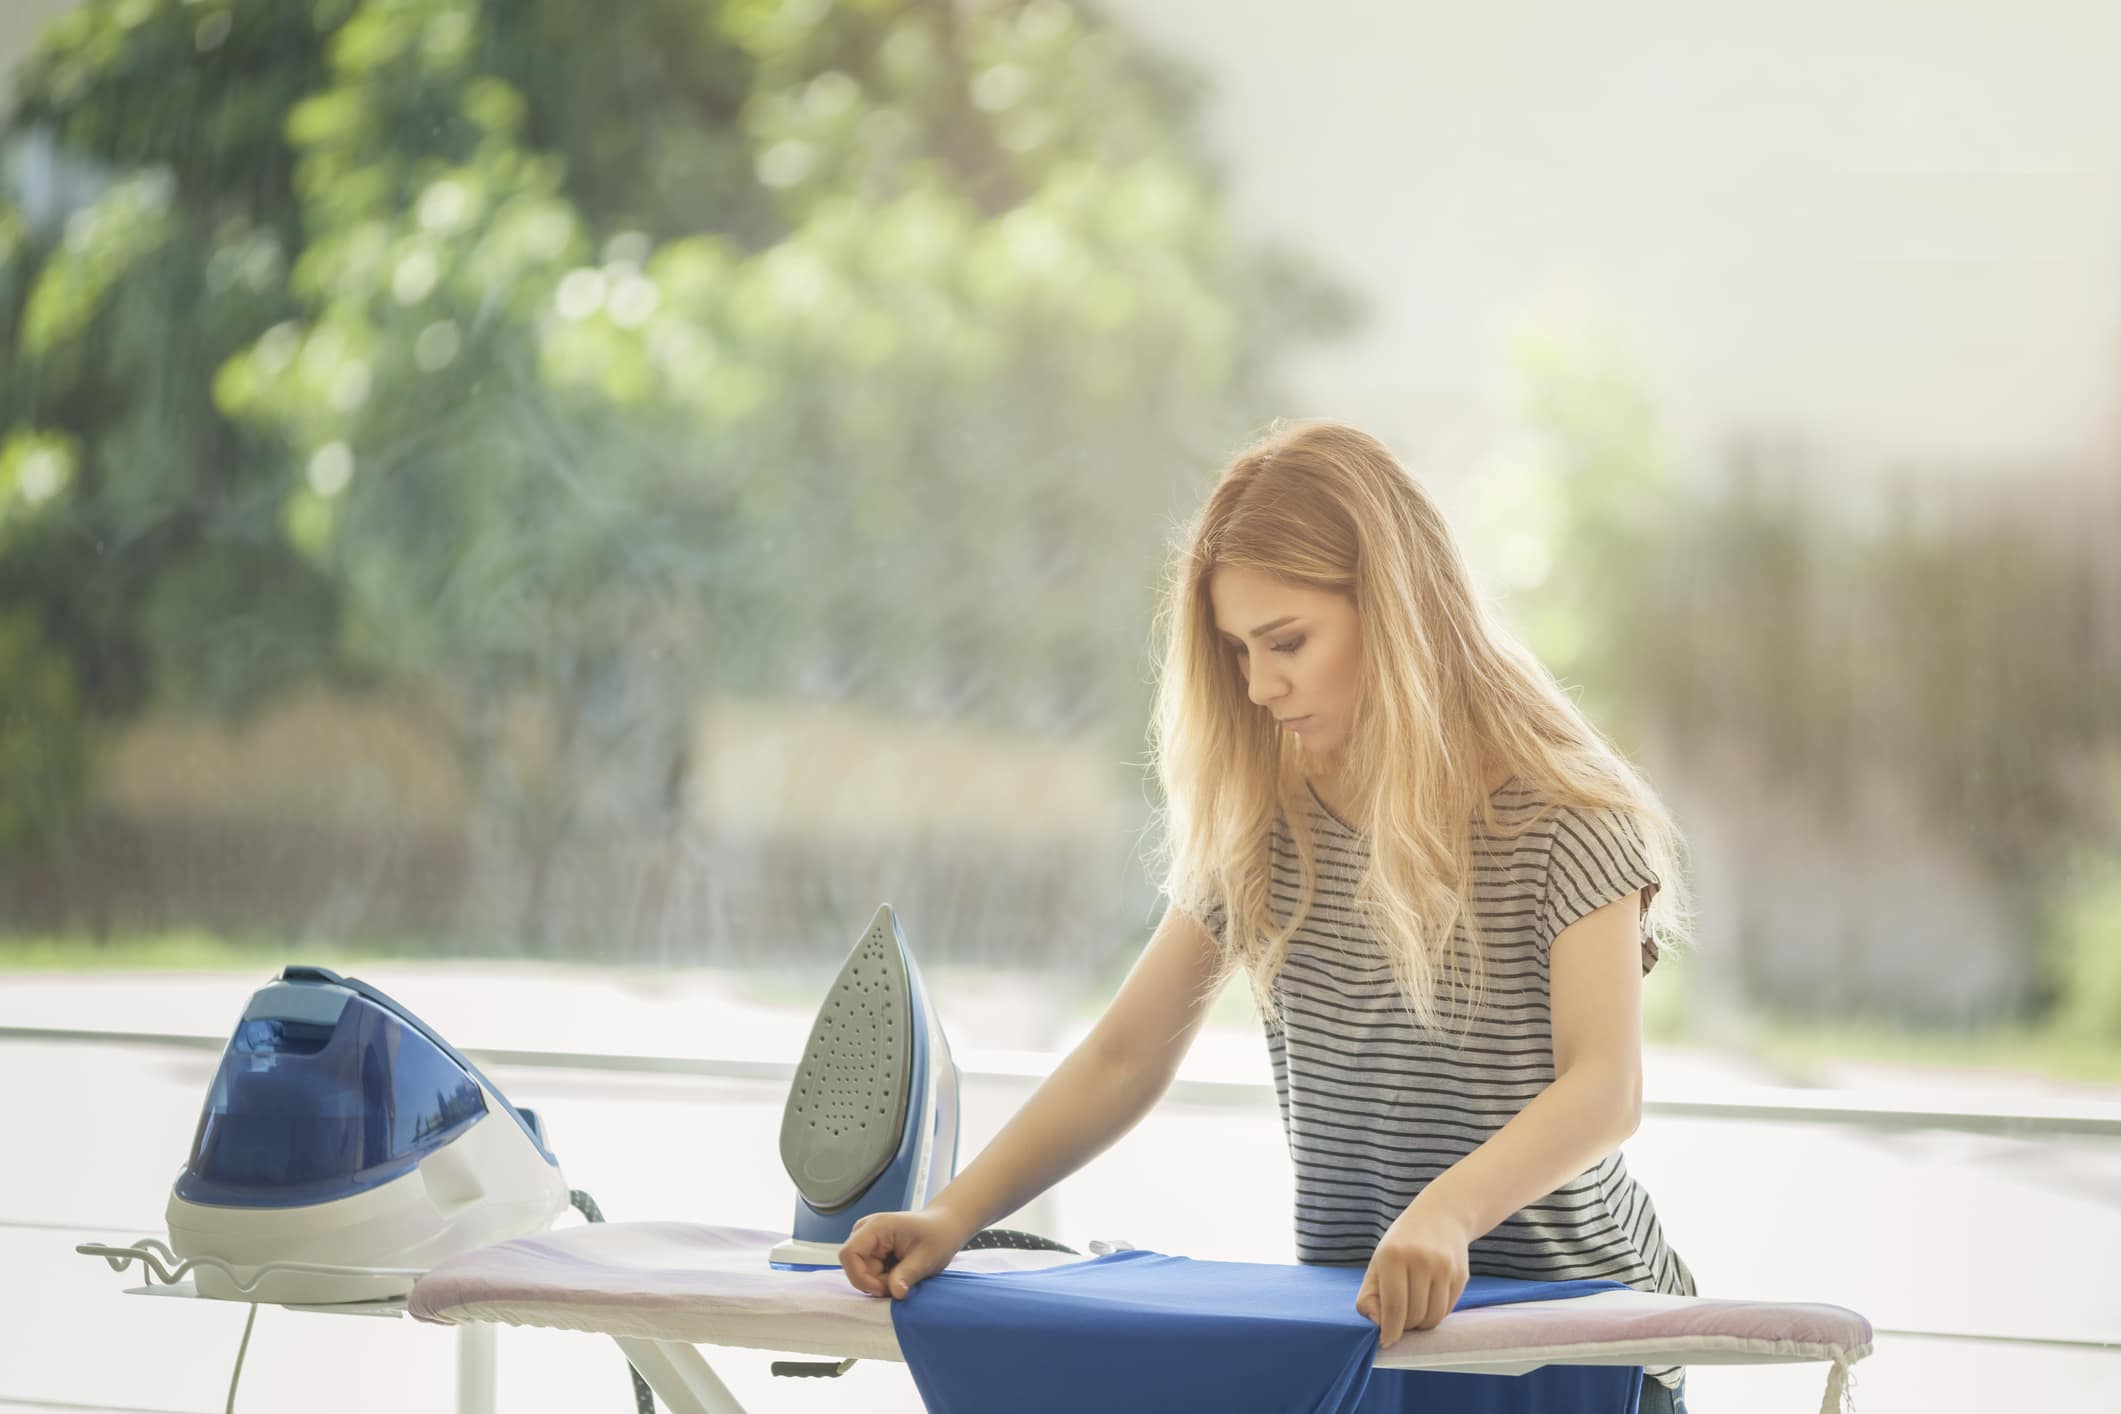 Woman ironing blue t-shirt on rack.